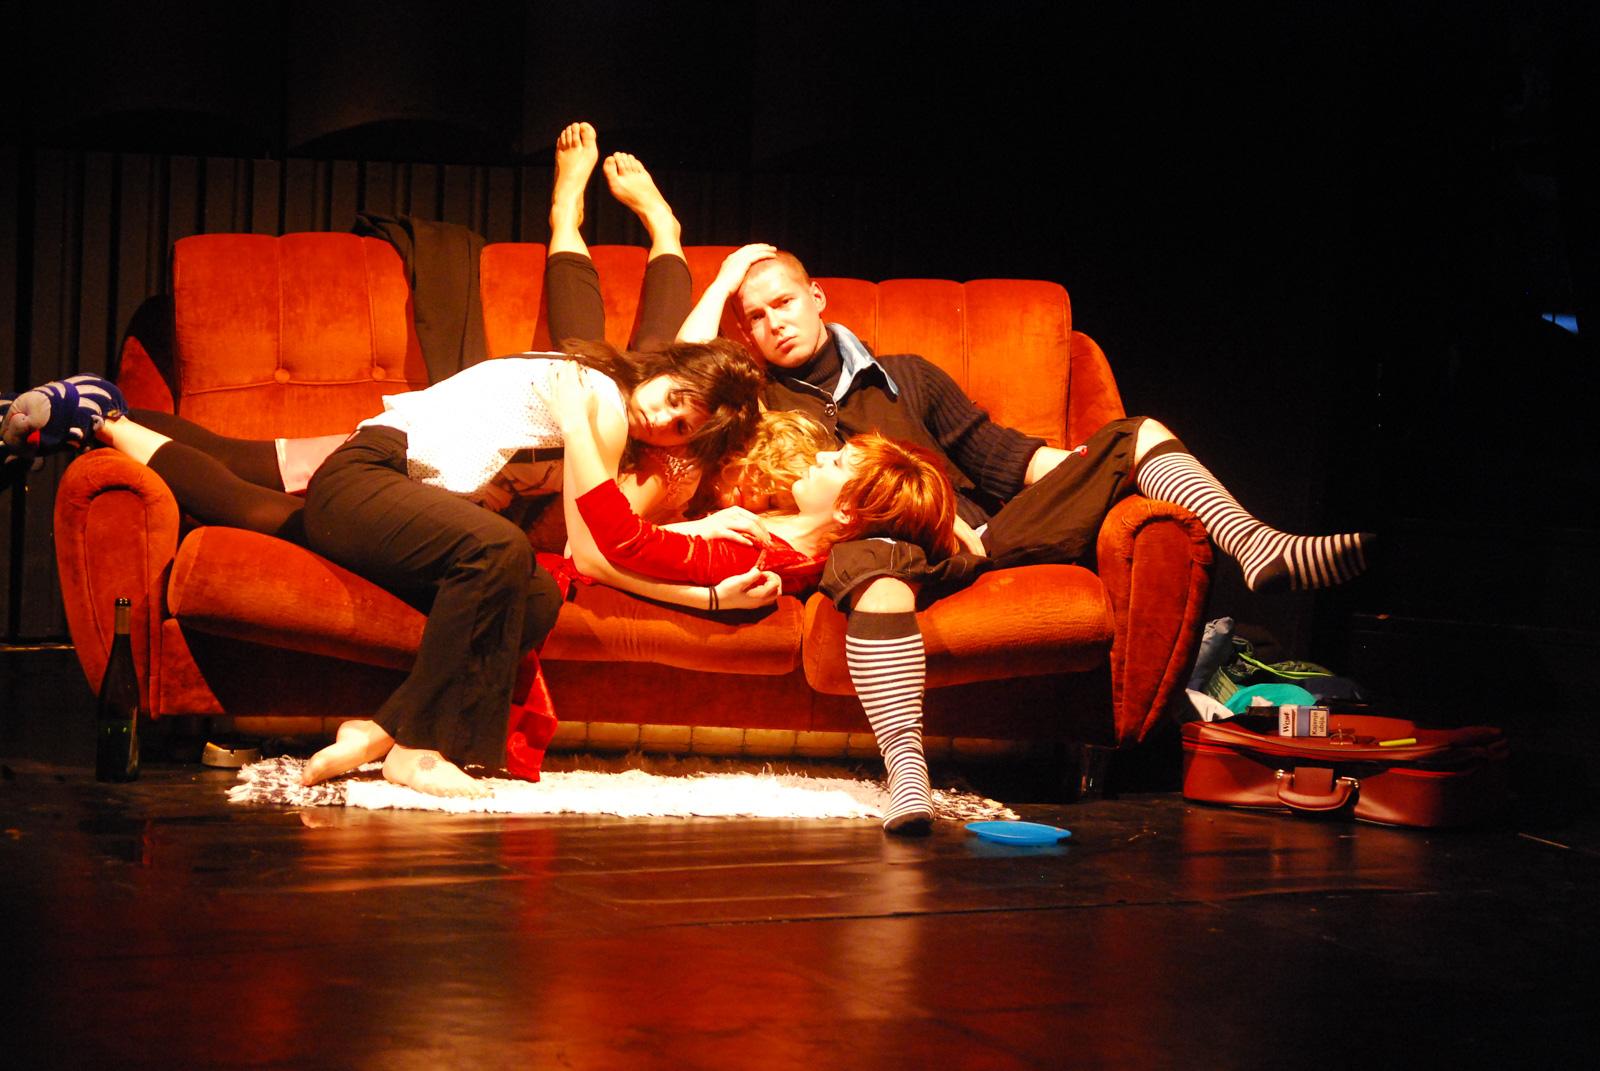 Teatro_Magico_Fantastico_16.jpg